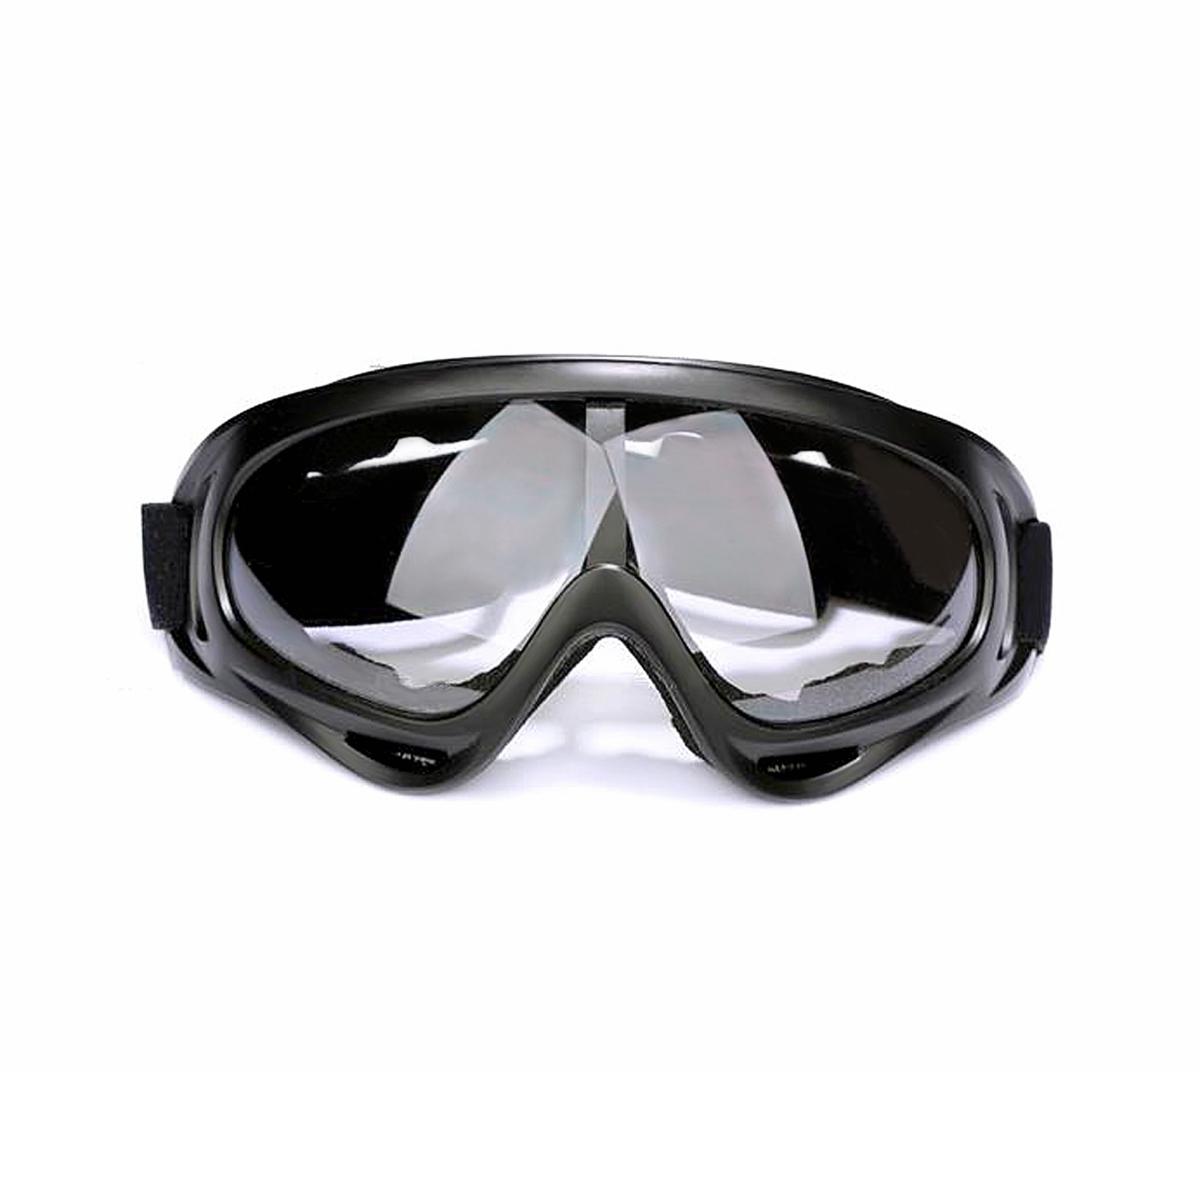 X400 Motorcycle Bike Cycling Wind Visor Glasses Goggles